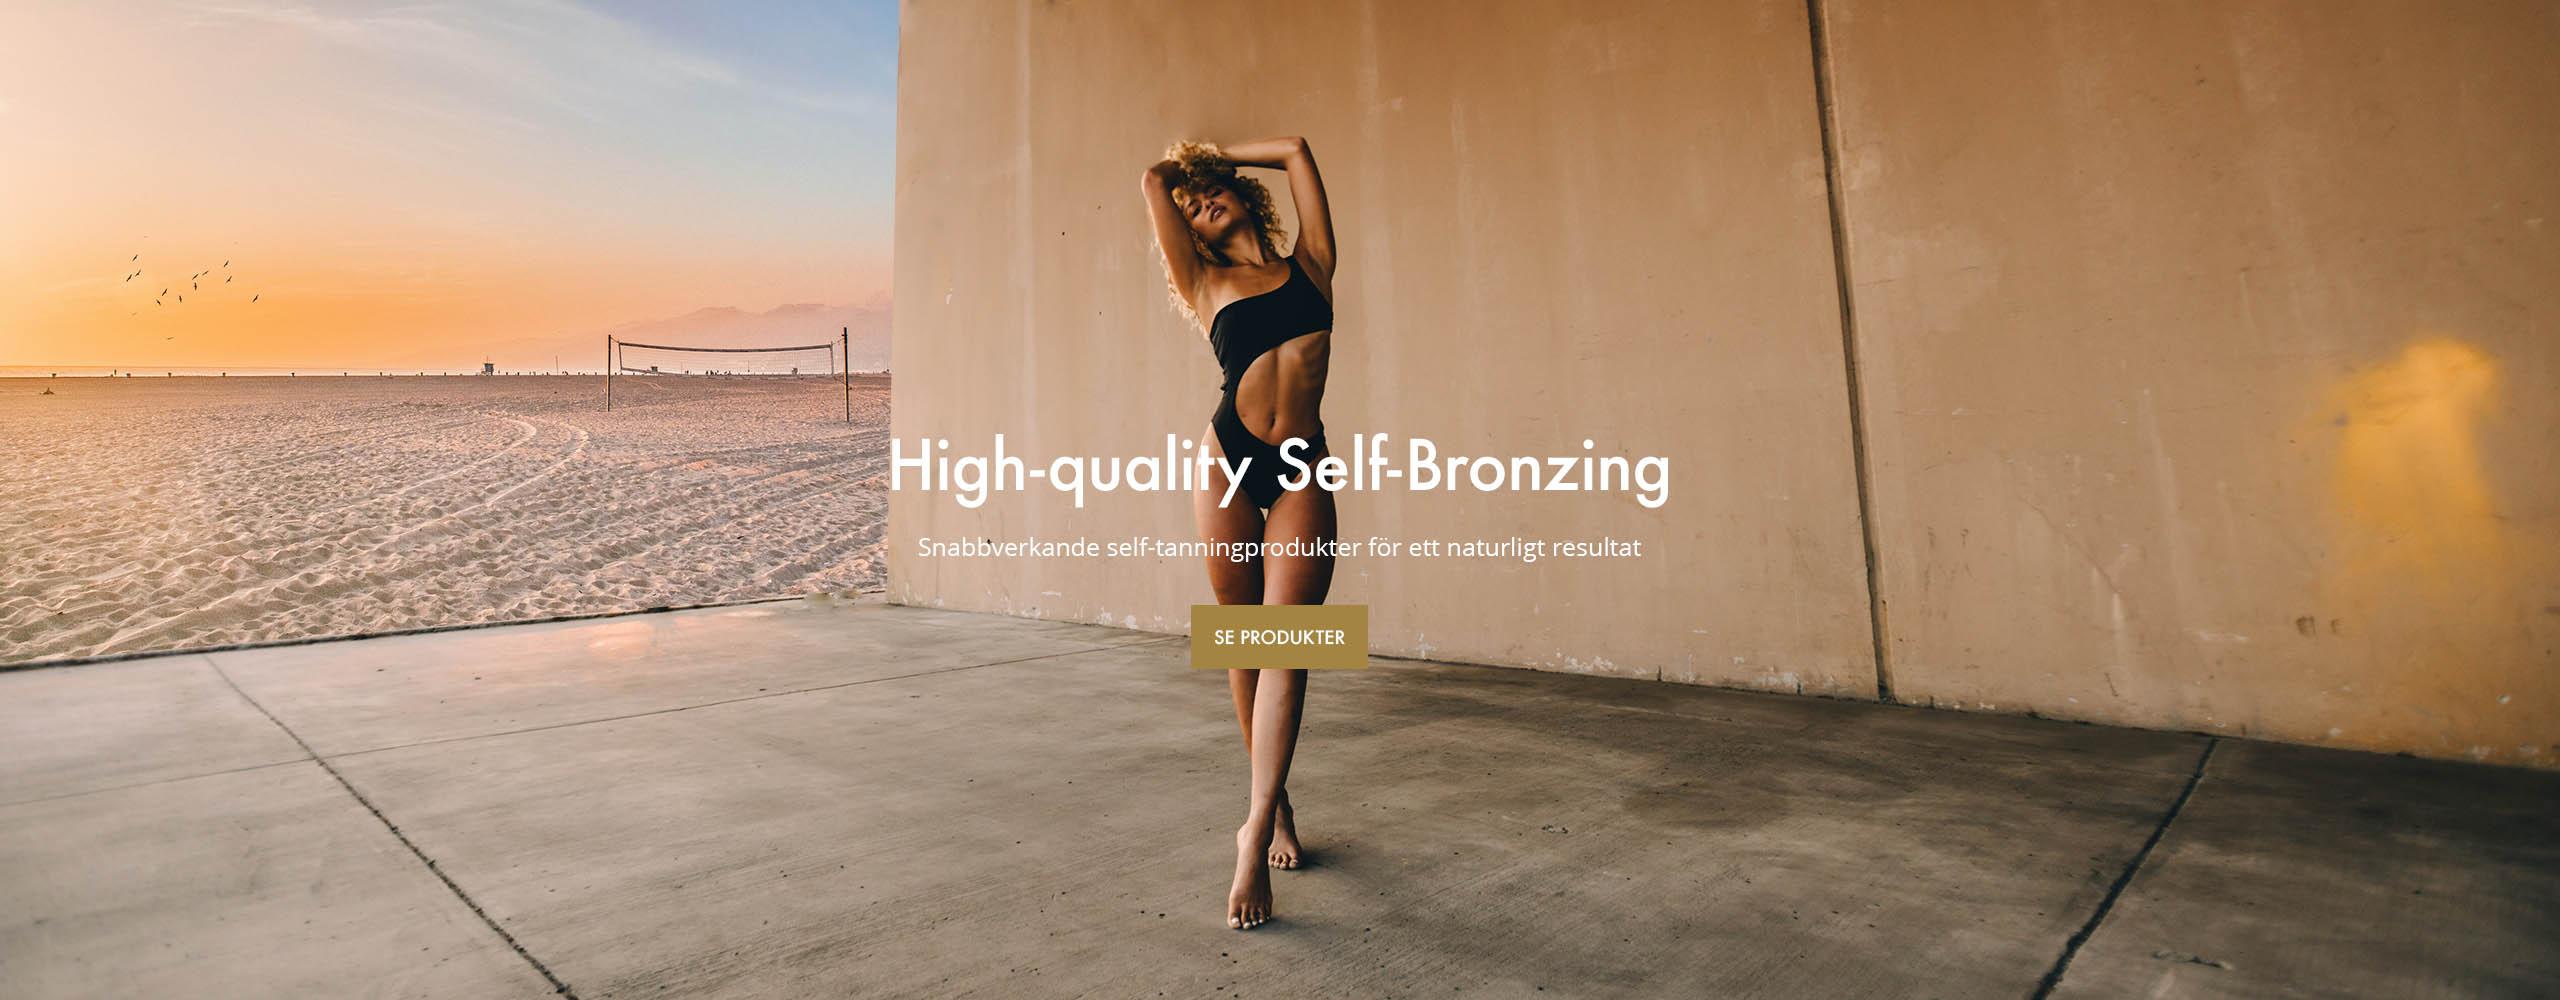 https://bronza.testavendre.se/image/751/Header_high-quality-bronzing-products-bronza-selftanning_med_text_2560x1000px.jpg